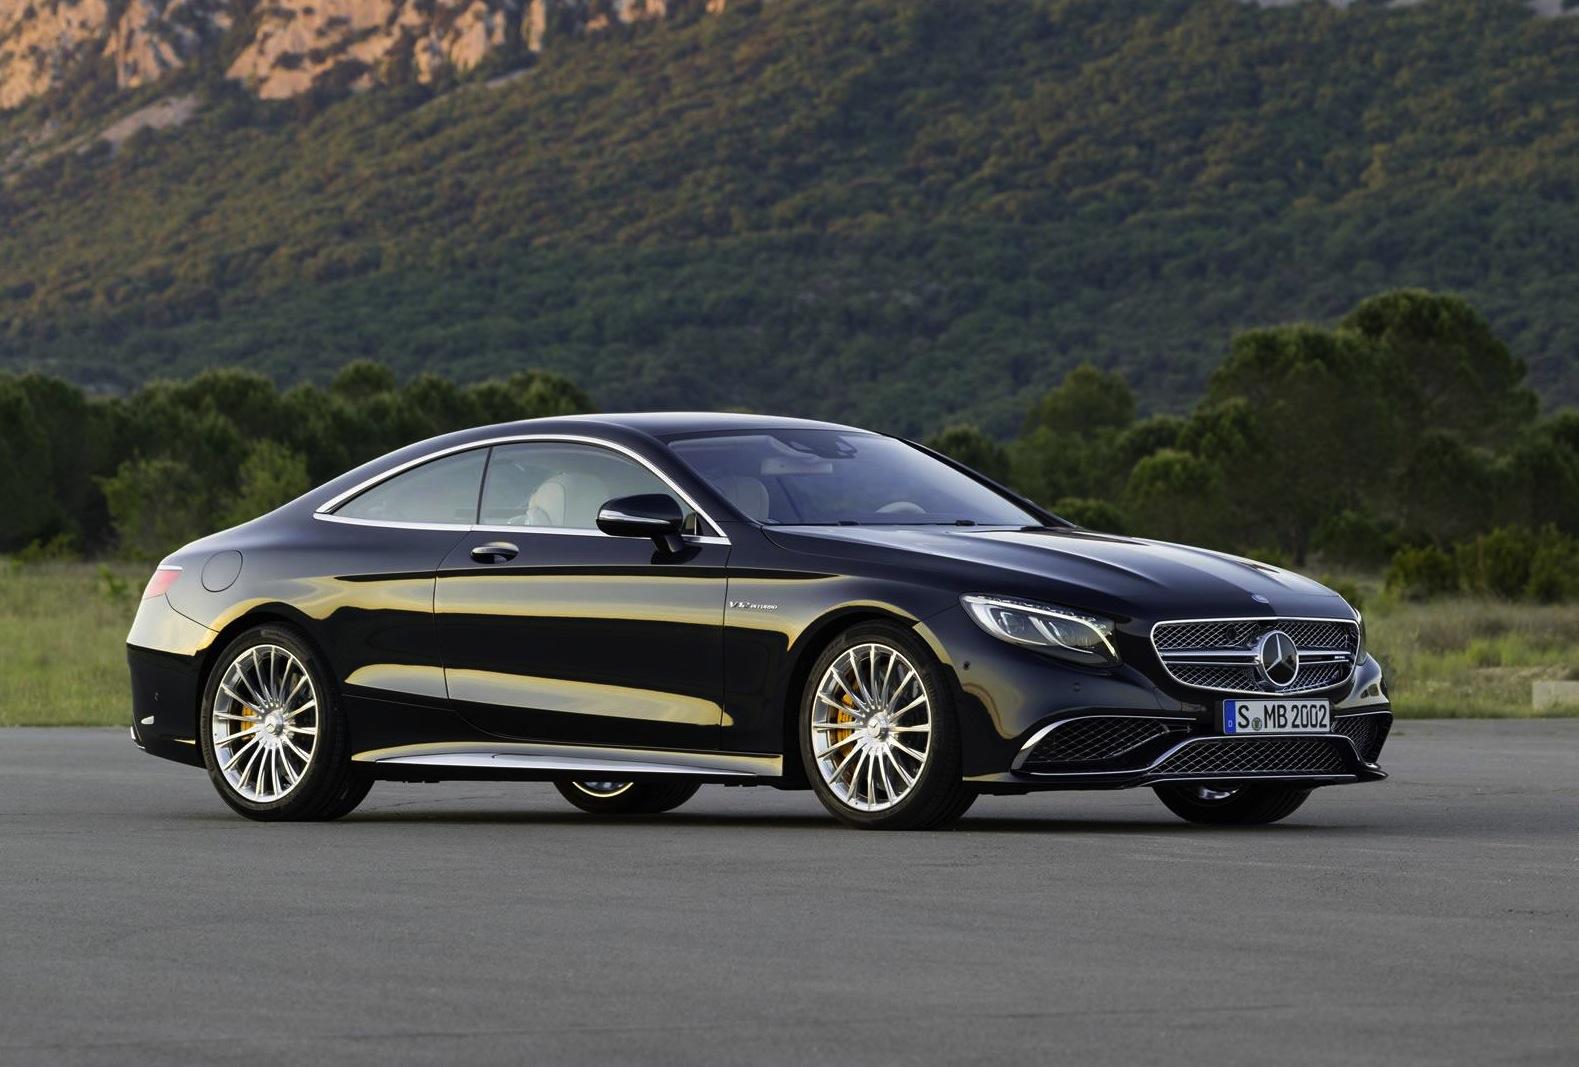 New Mercedes-Benz S 65 AMG Coupe V12 monster revealed